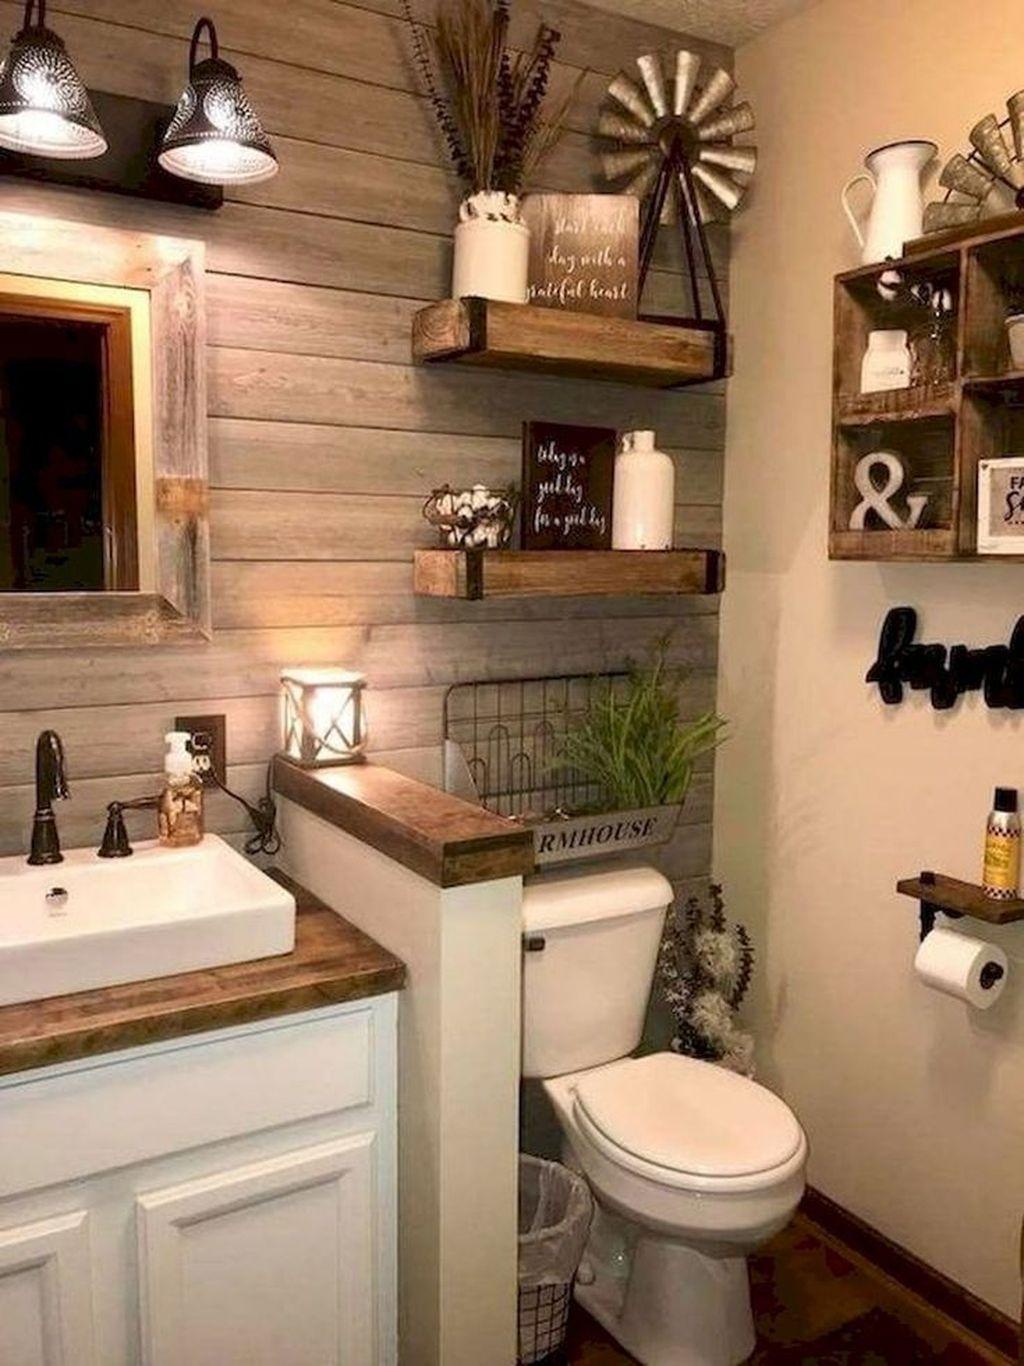 Fascinating Rustic Bathroom Decor Ideas You Must Copy 19